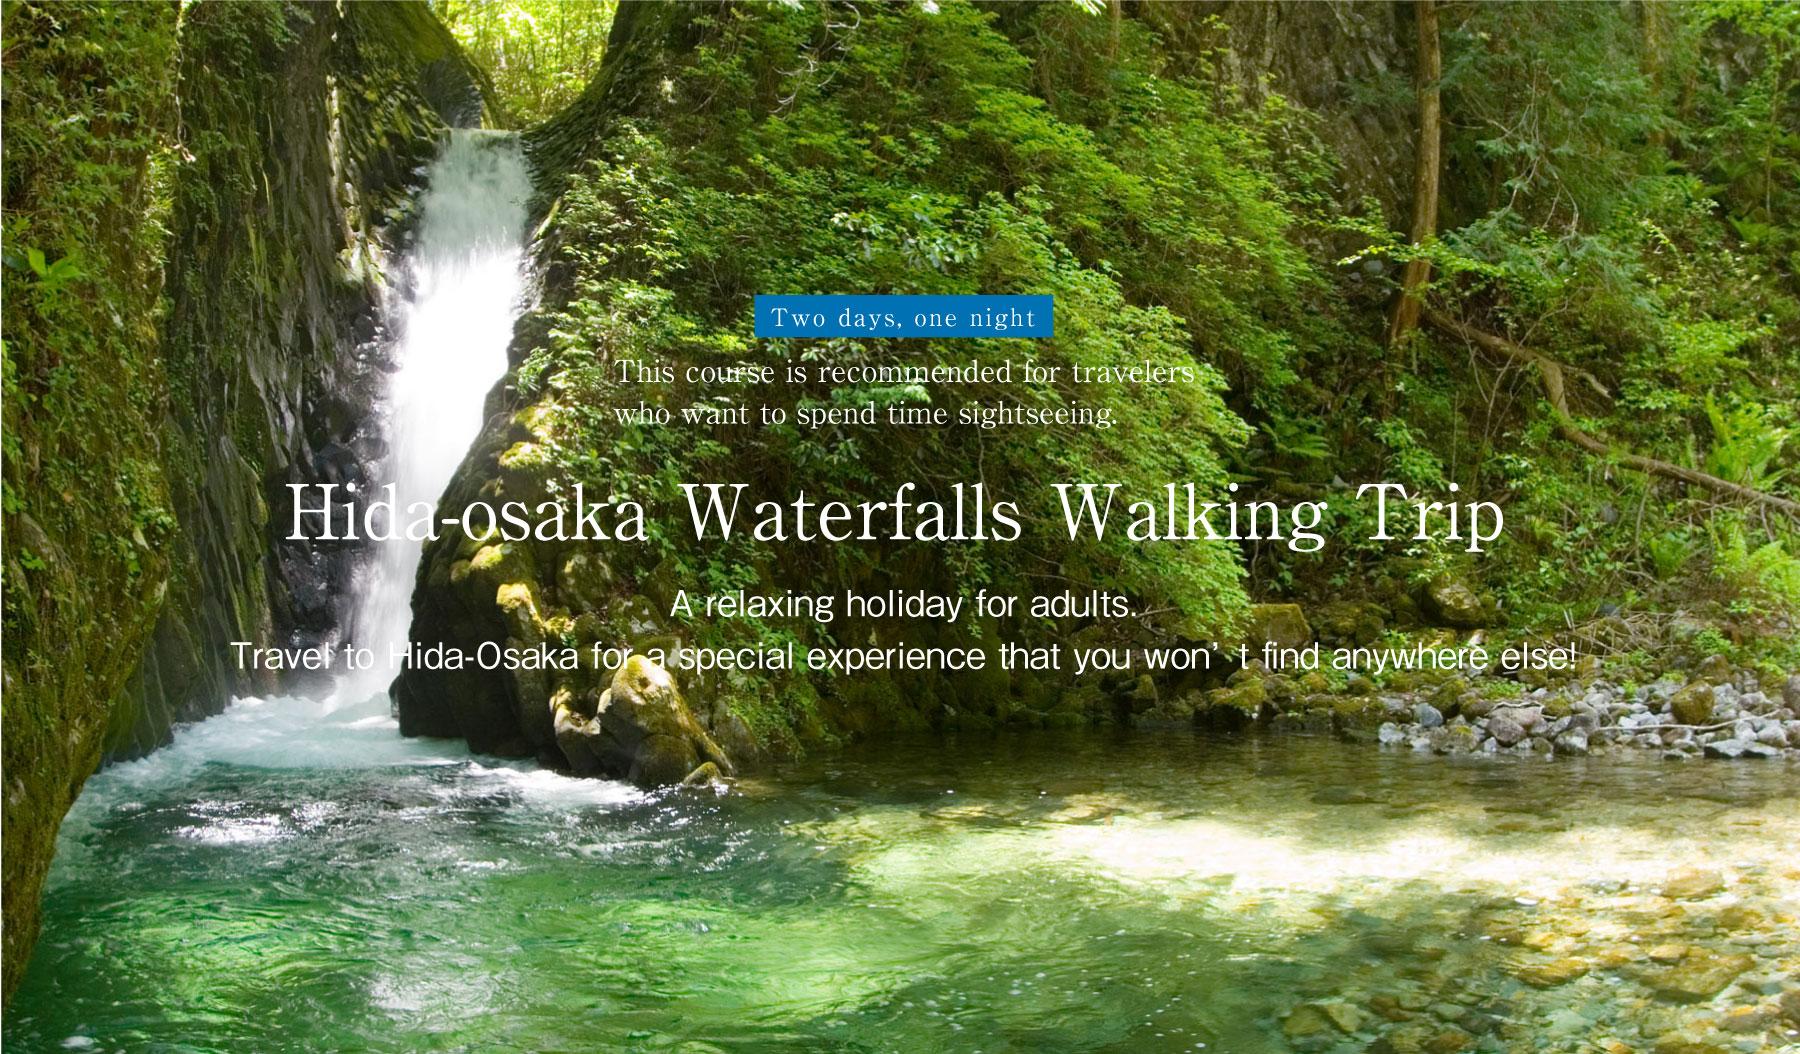 Hida-Osaka Waterfalls Walking Trip